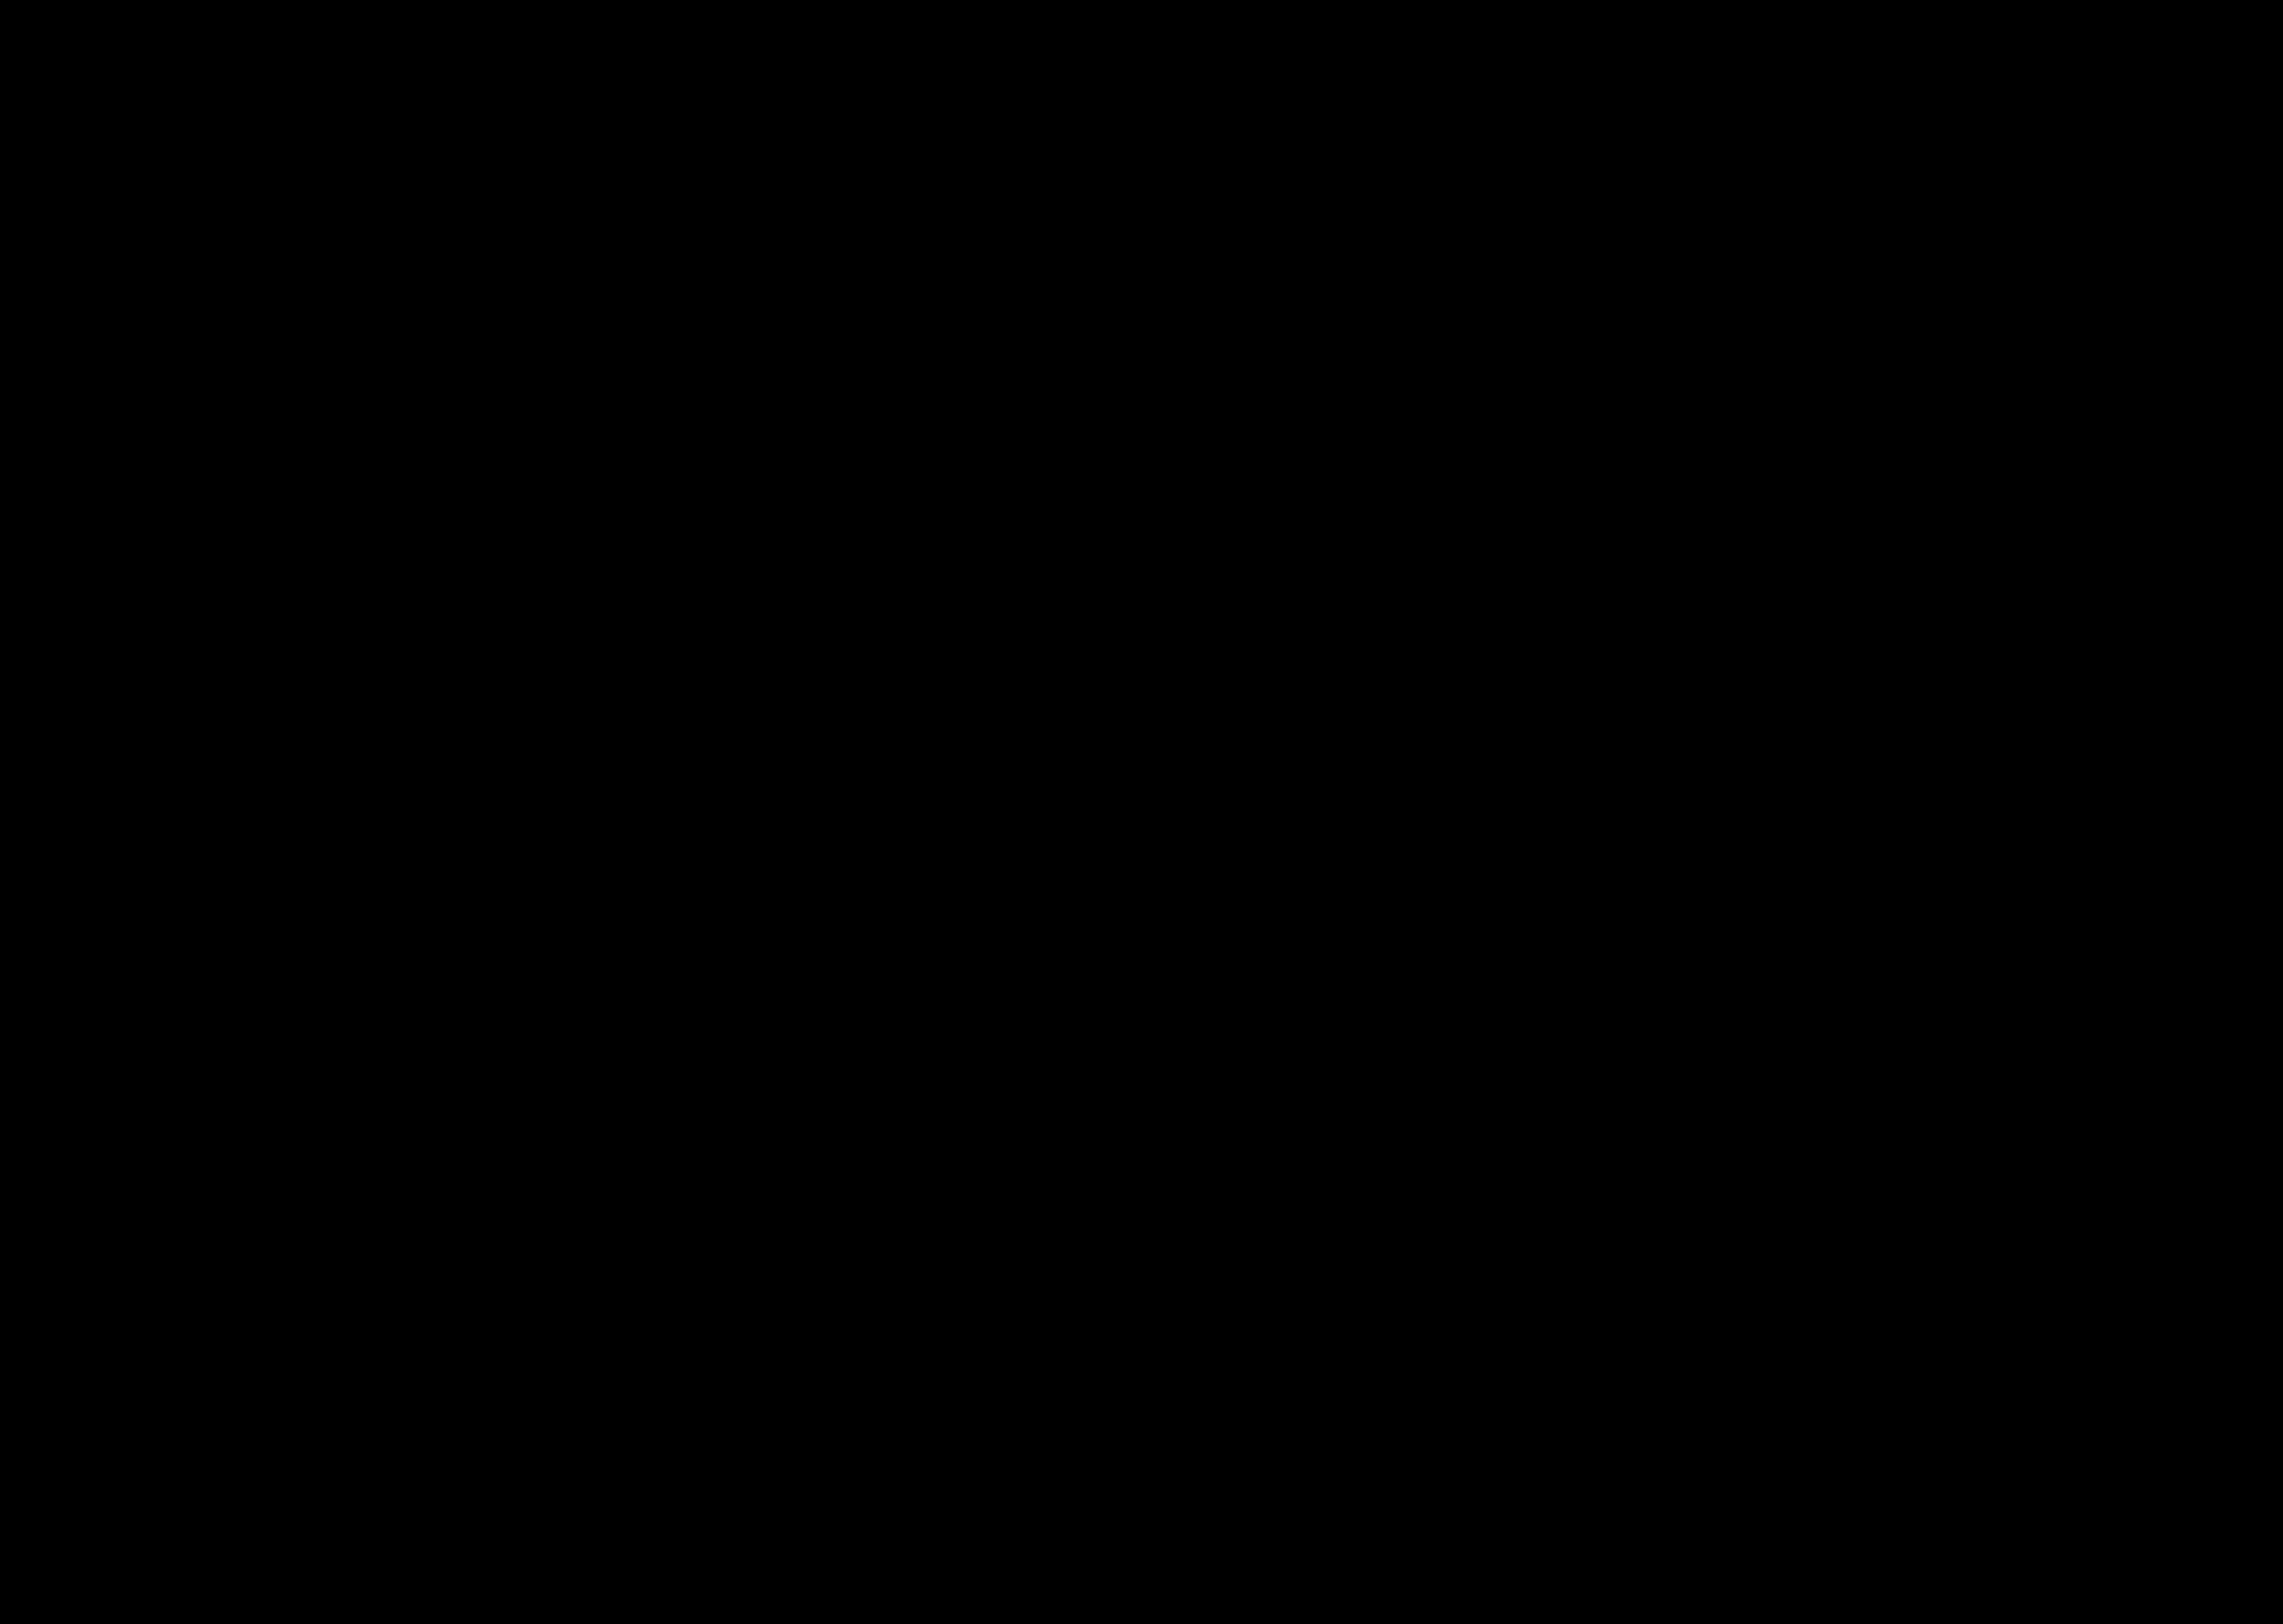 clipart - f1 circuits 2014-2018